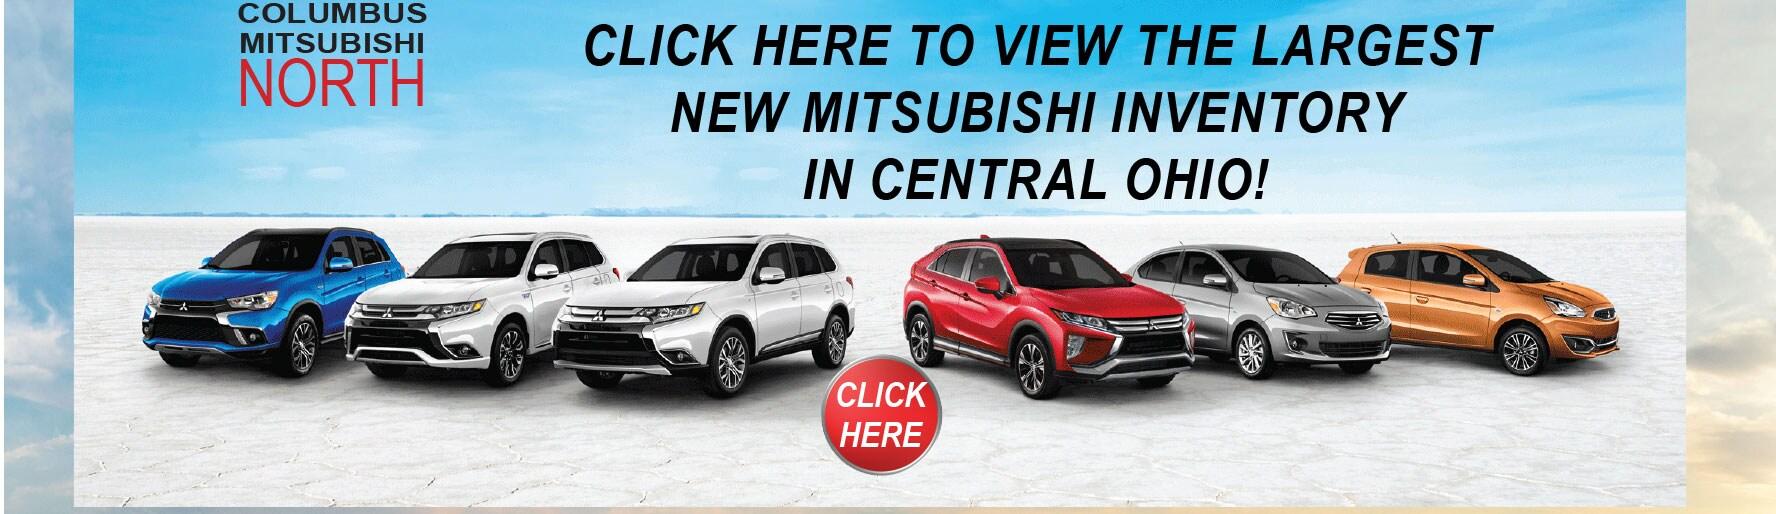 Mitsubishi Dealers Columbus Ohio Used Cars Still Brum Brum - Ohio mitsubishi dealers